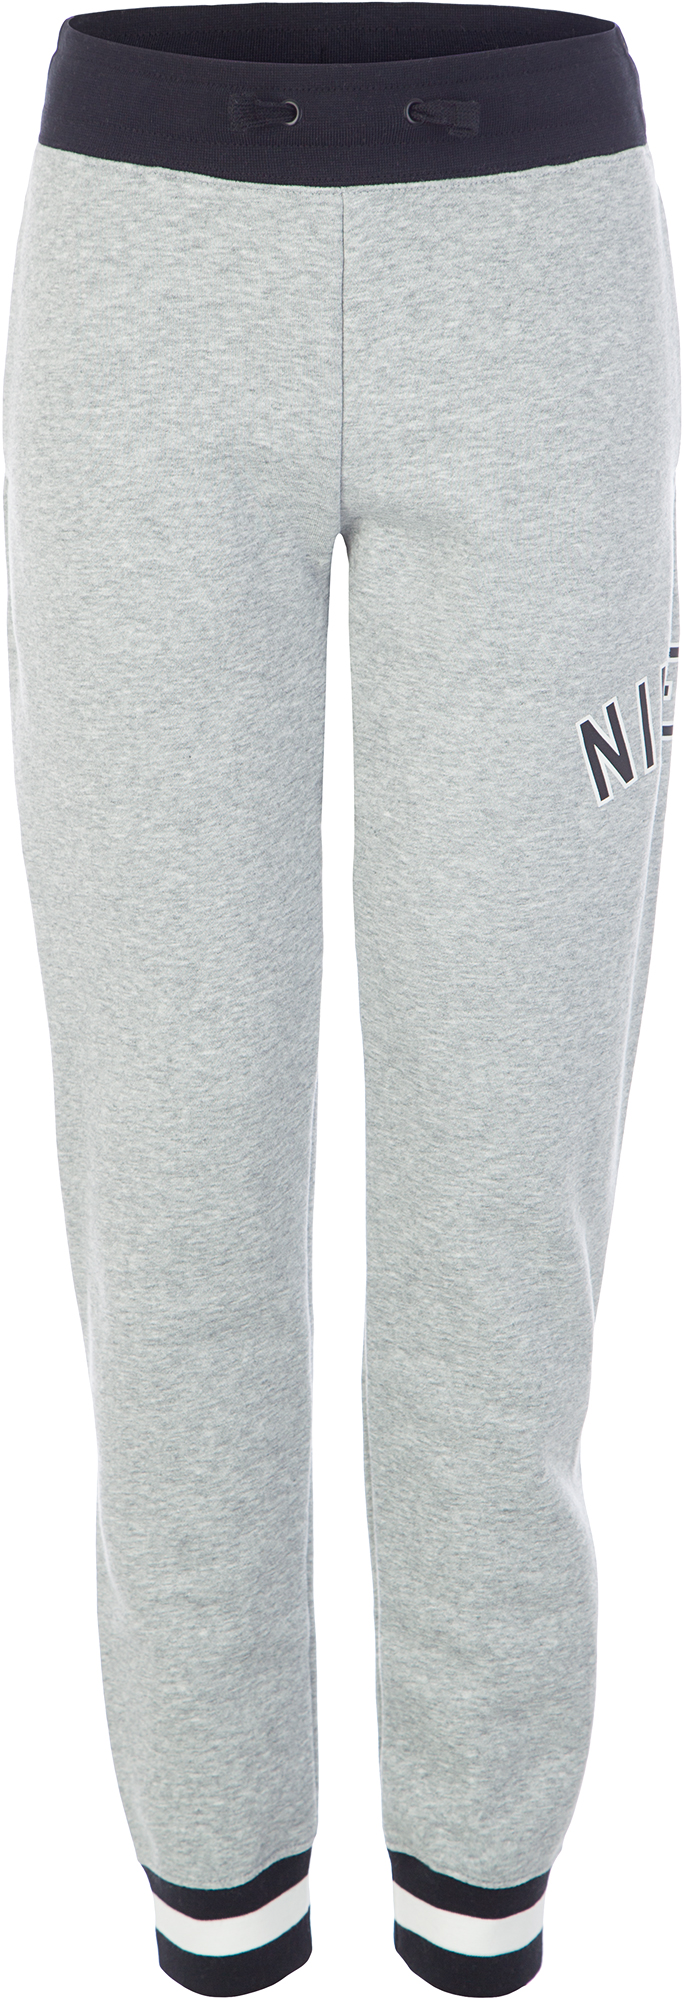 Nike Брюки для мальчиков Nike Air, размер 158-170